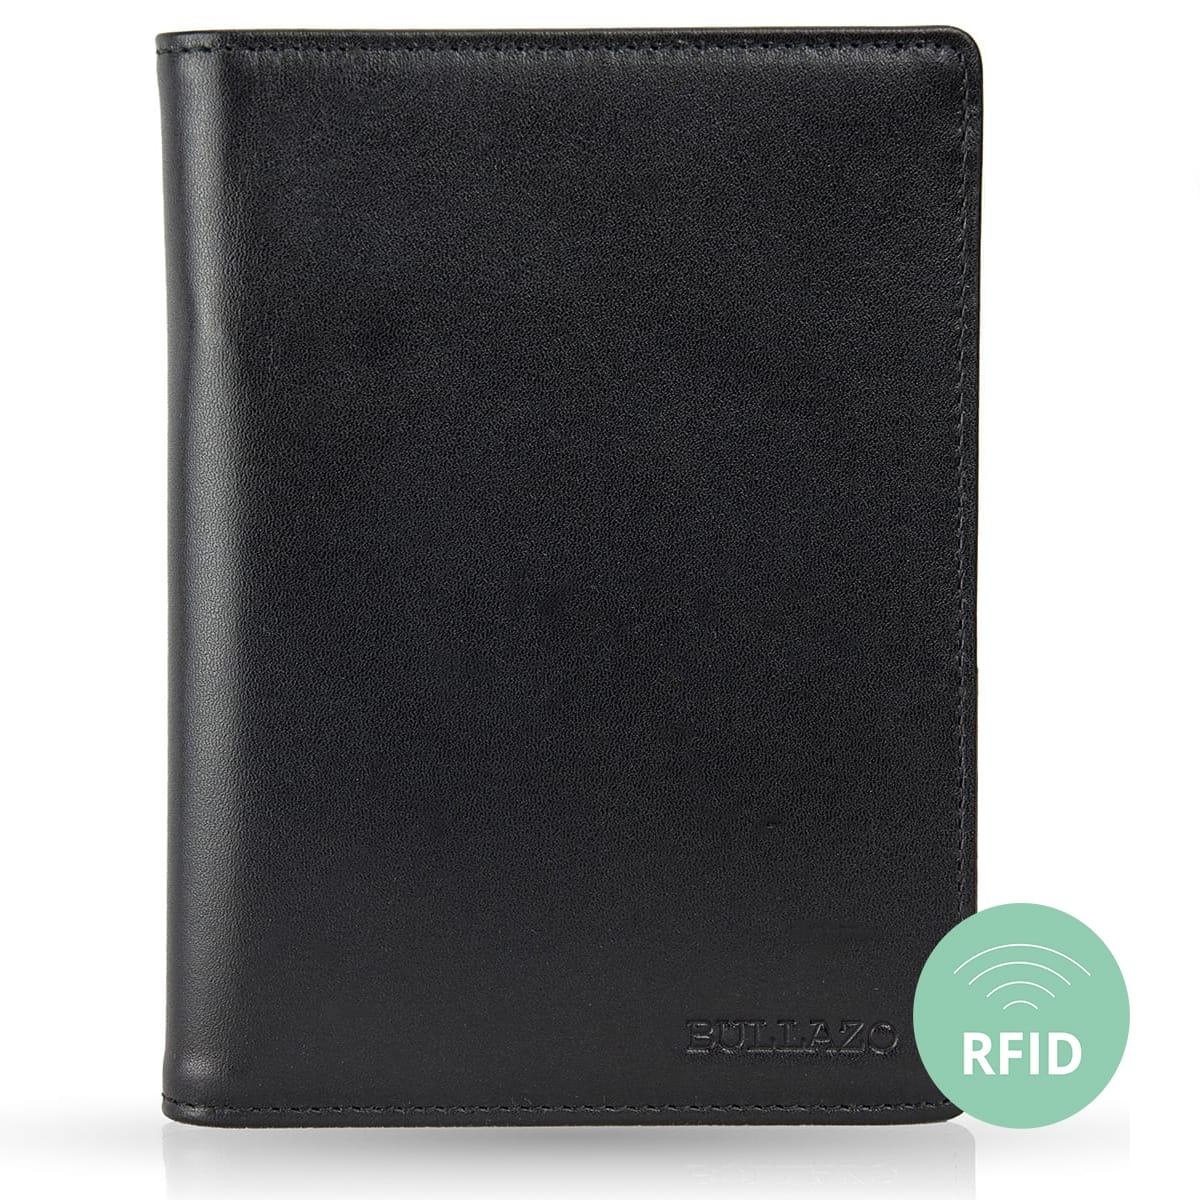 BULLAZO Plano Grau Edle gro/ße Reisepassh/ülle aus Leder mit RFID Schutz